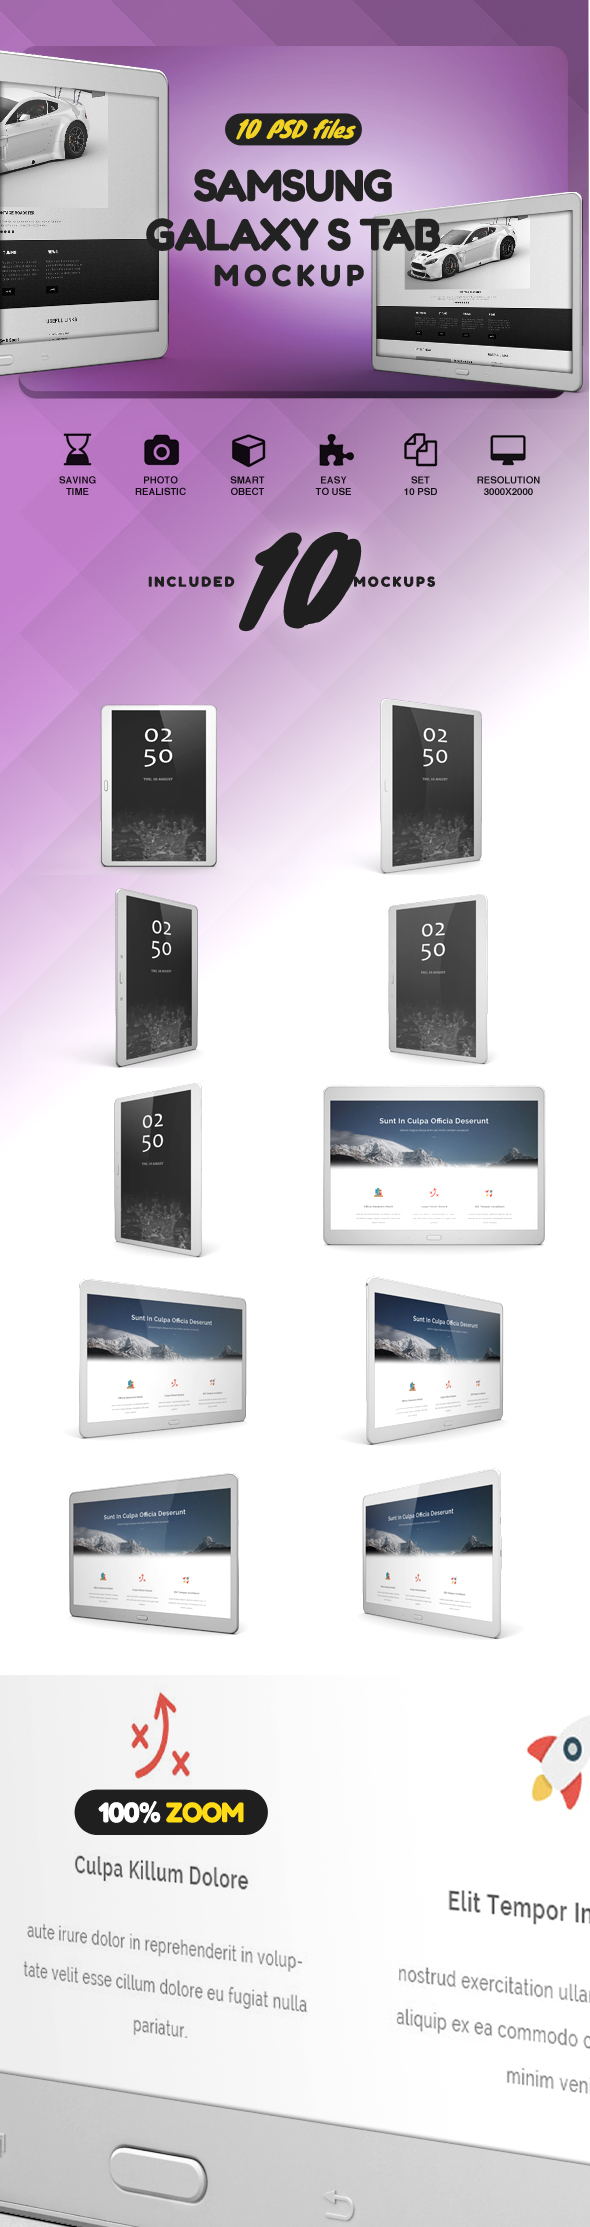 Samsung Galaxy S Tab Mockup example image 2